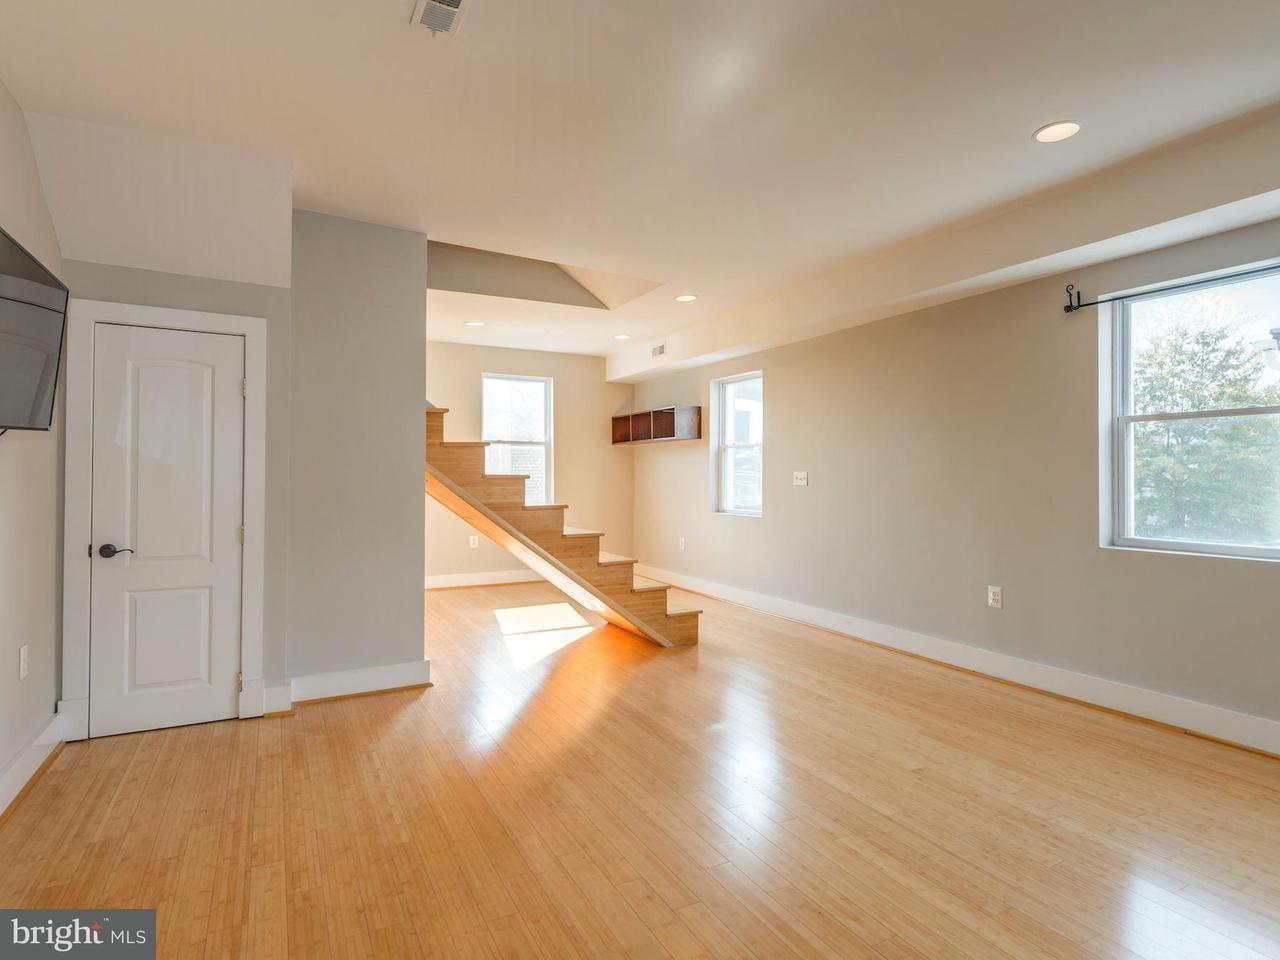 Additional photo for property listing at 1409 G St Ne #26 1409 G St Ne #26 华盛顿市, 哥伦比亚特区 20002 美国